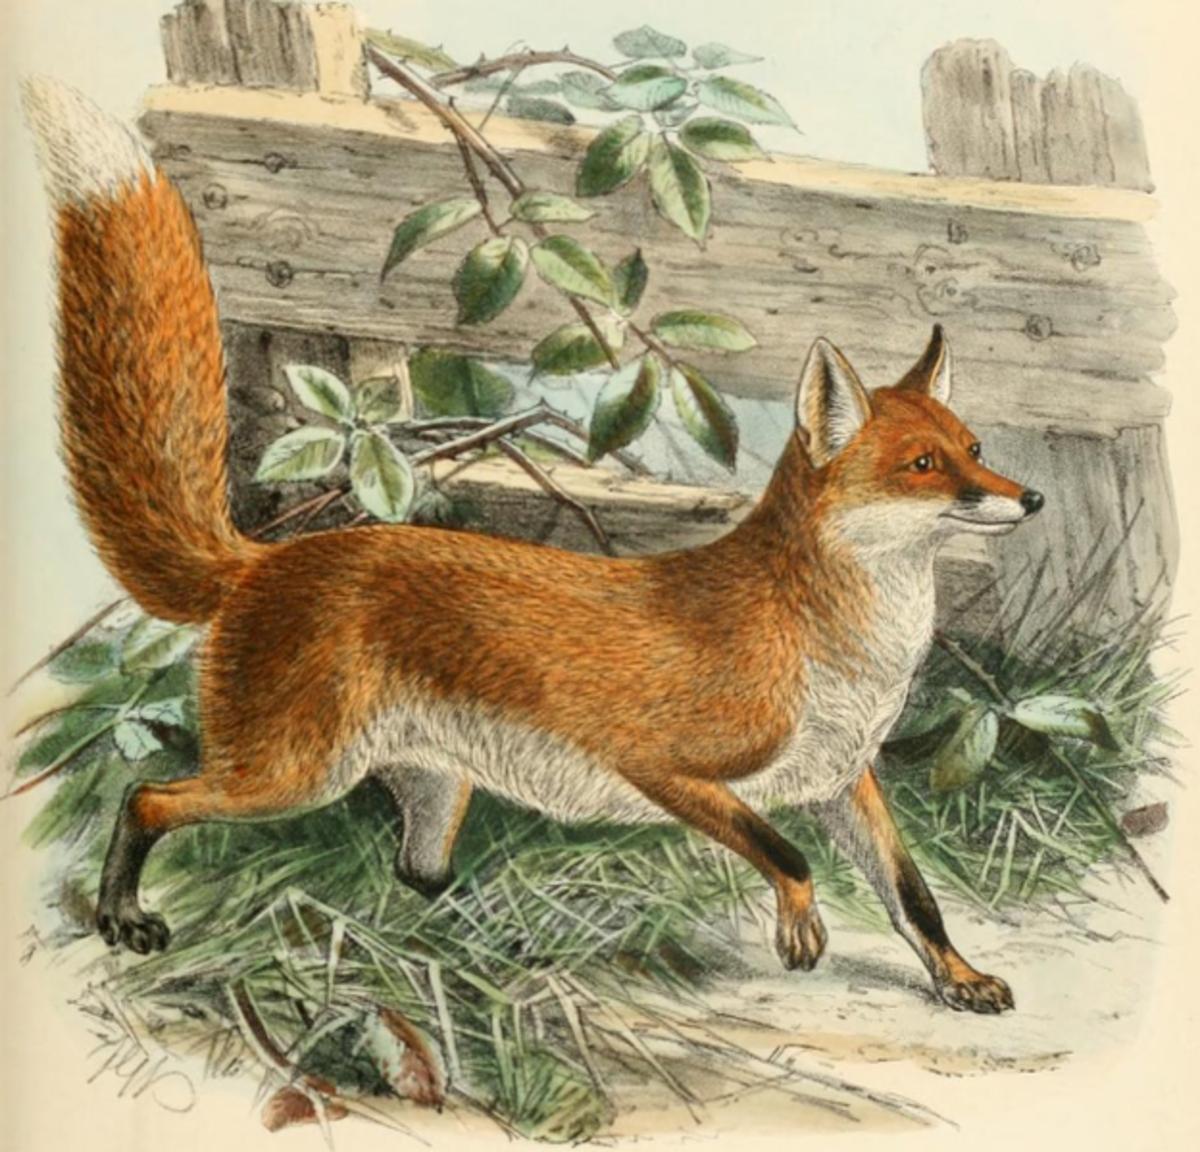 Mivart, St. George Jackson, 1827-1900 public domain